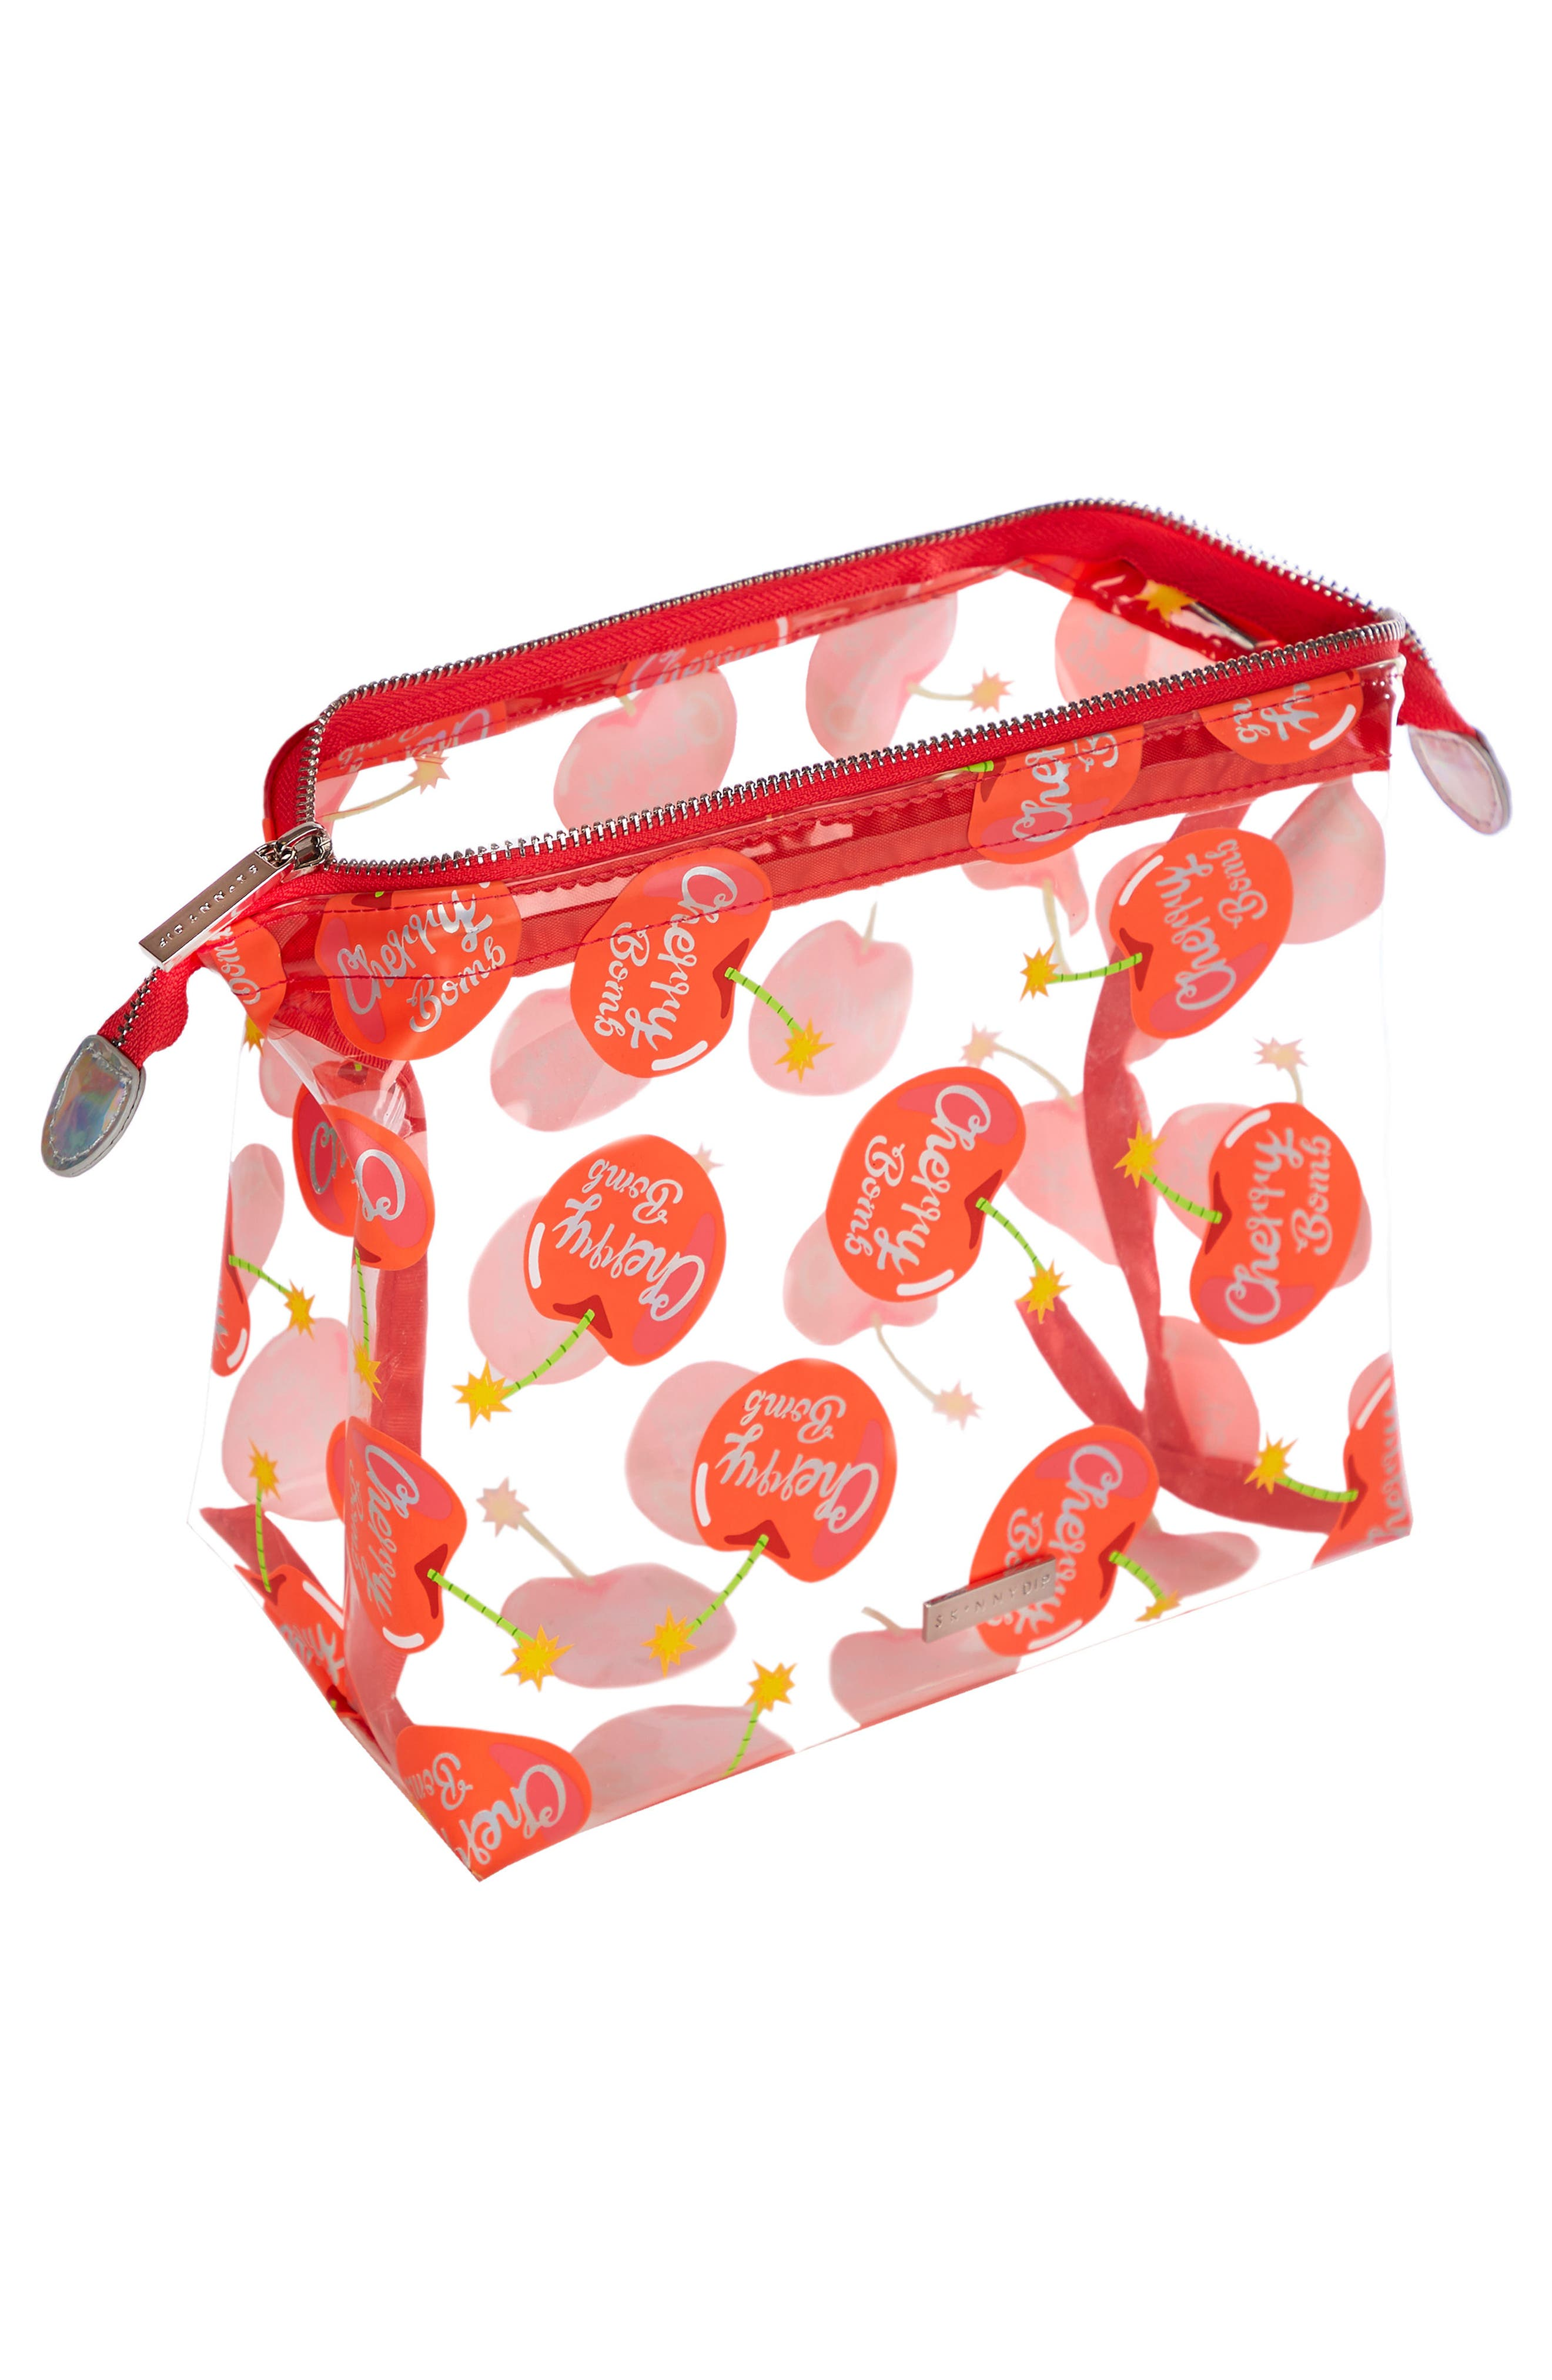 Cherry Bomb Cosmetics Case,                             Alternate thumbnail 2, color,                             NO COLOR